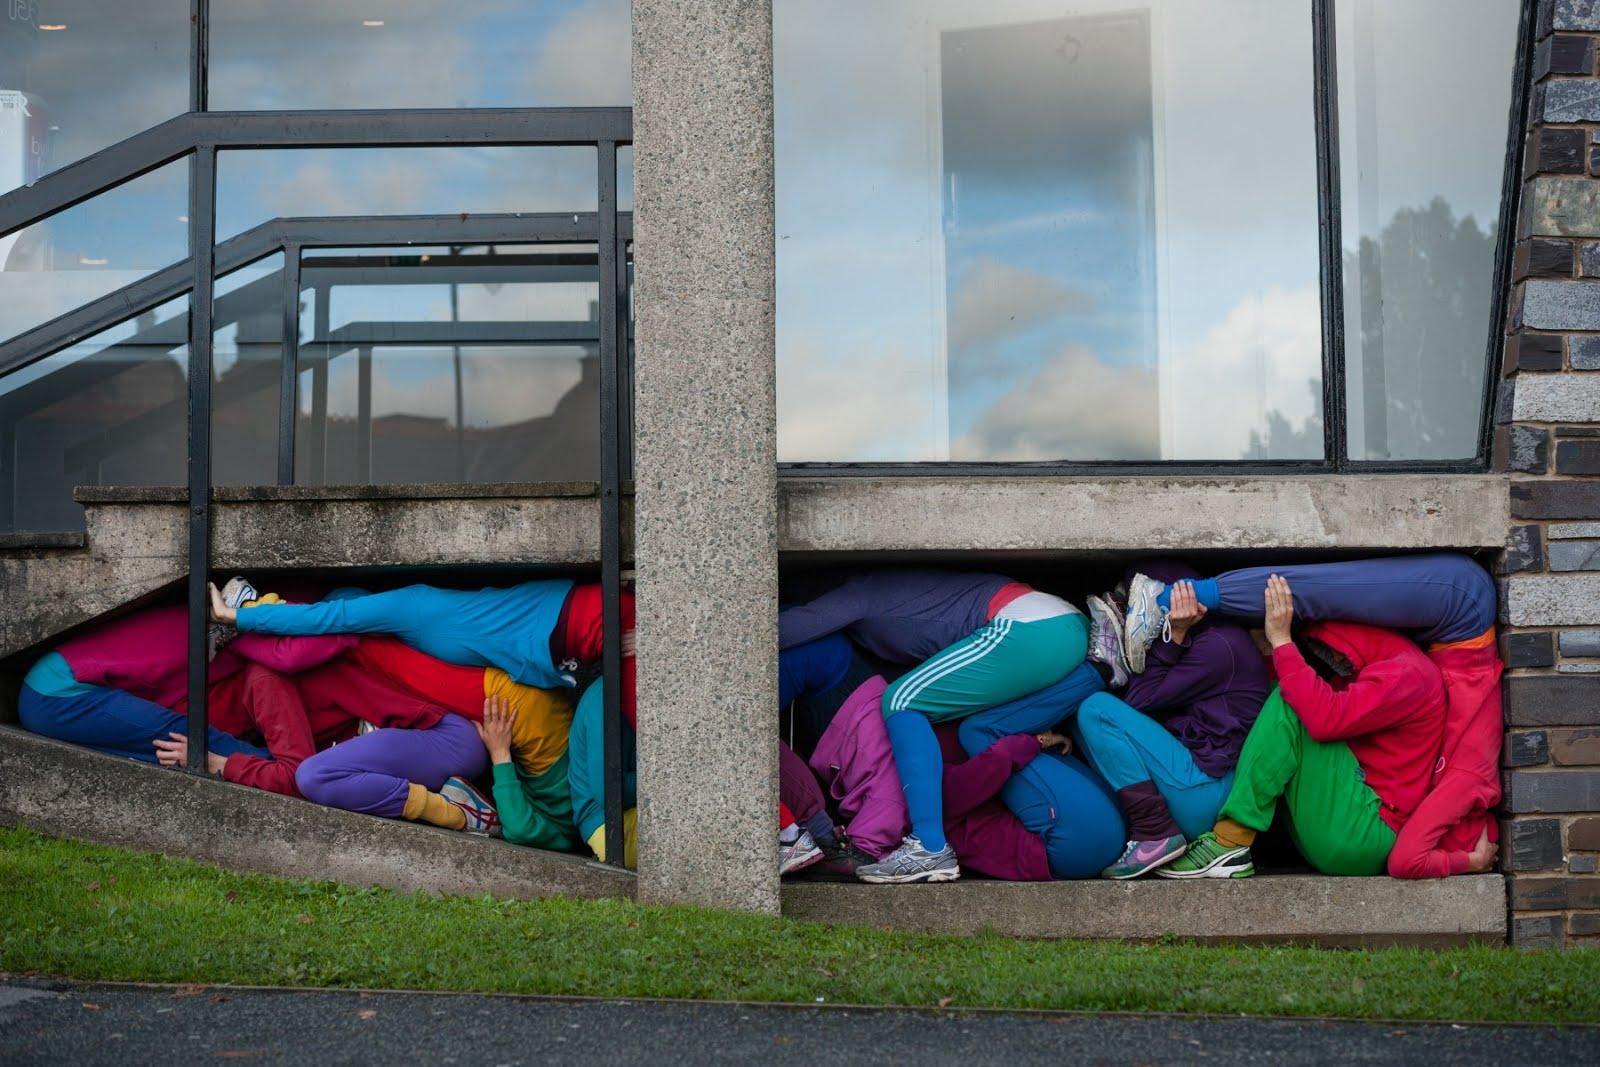 Pin By Samantha Averitt On The Art Of Graffiti Street Art